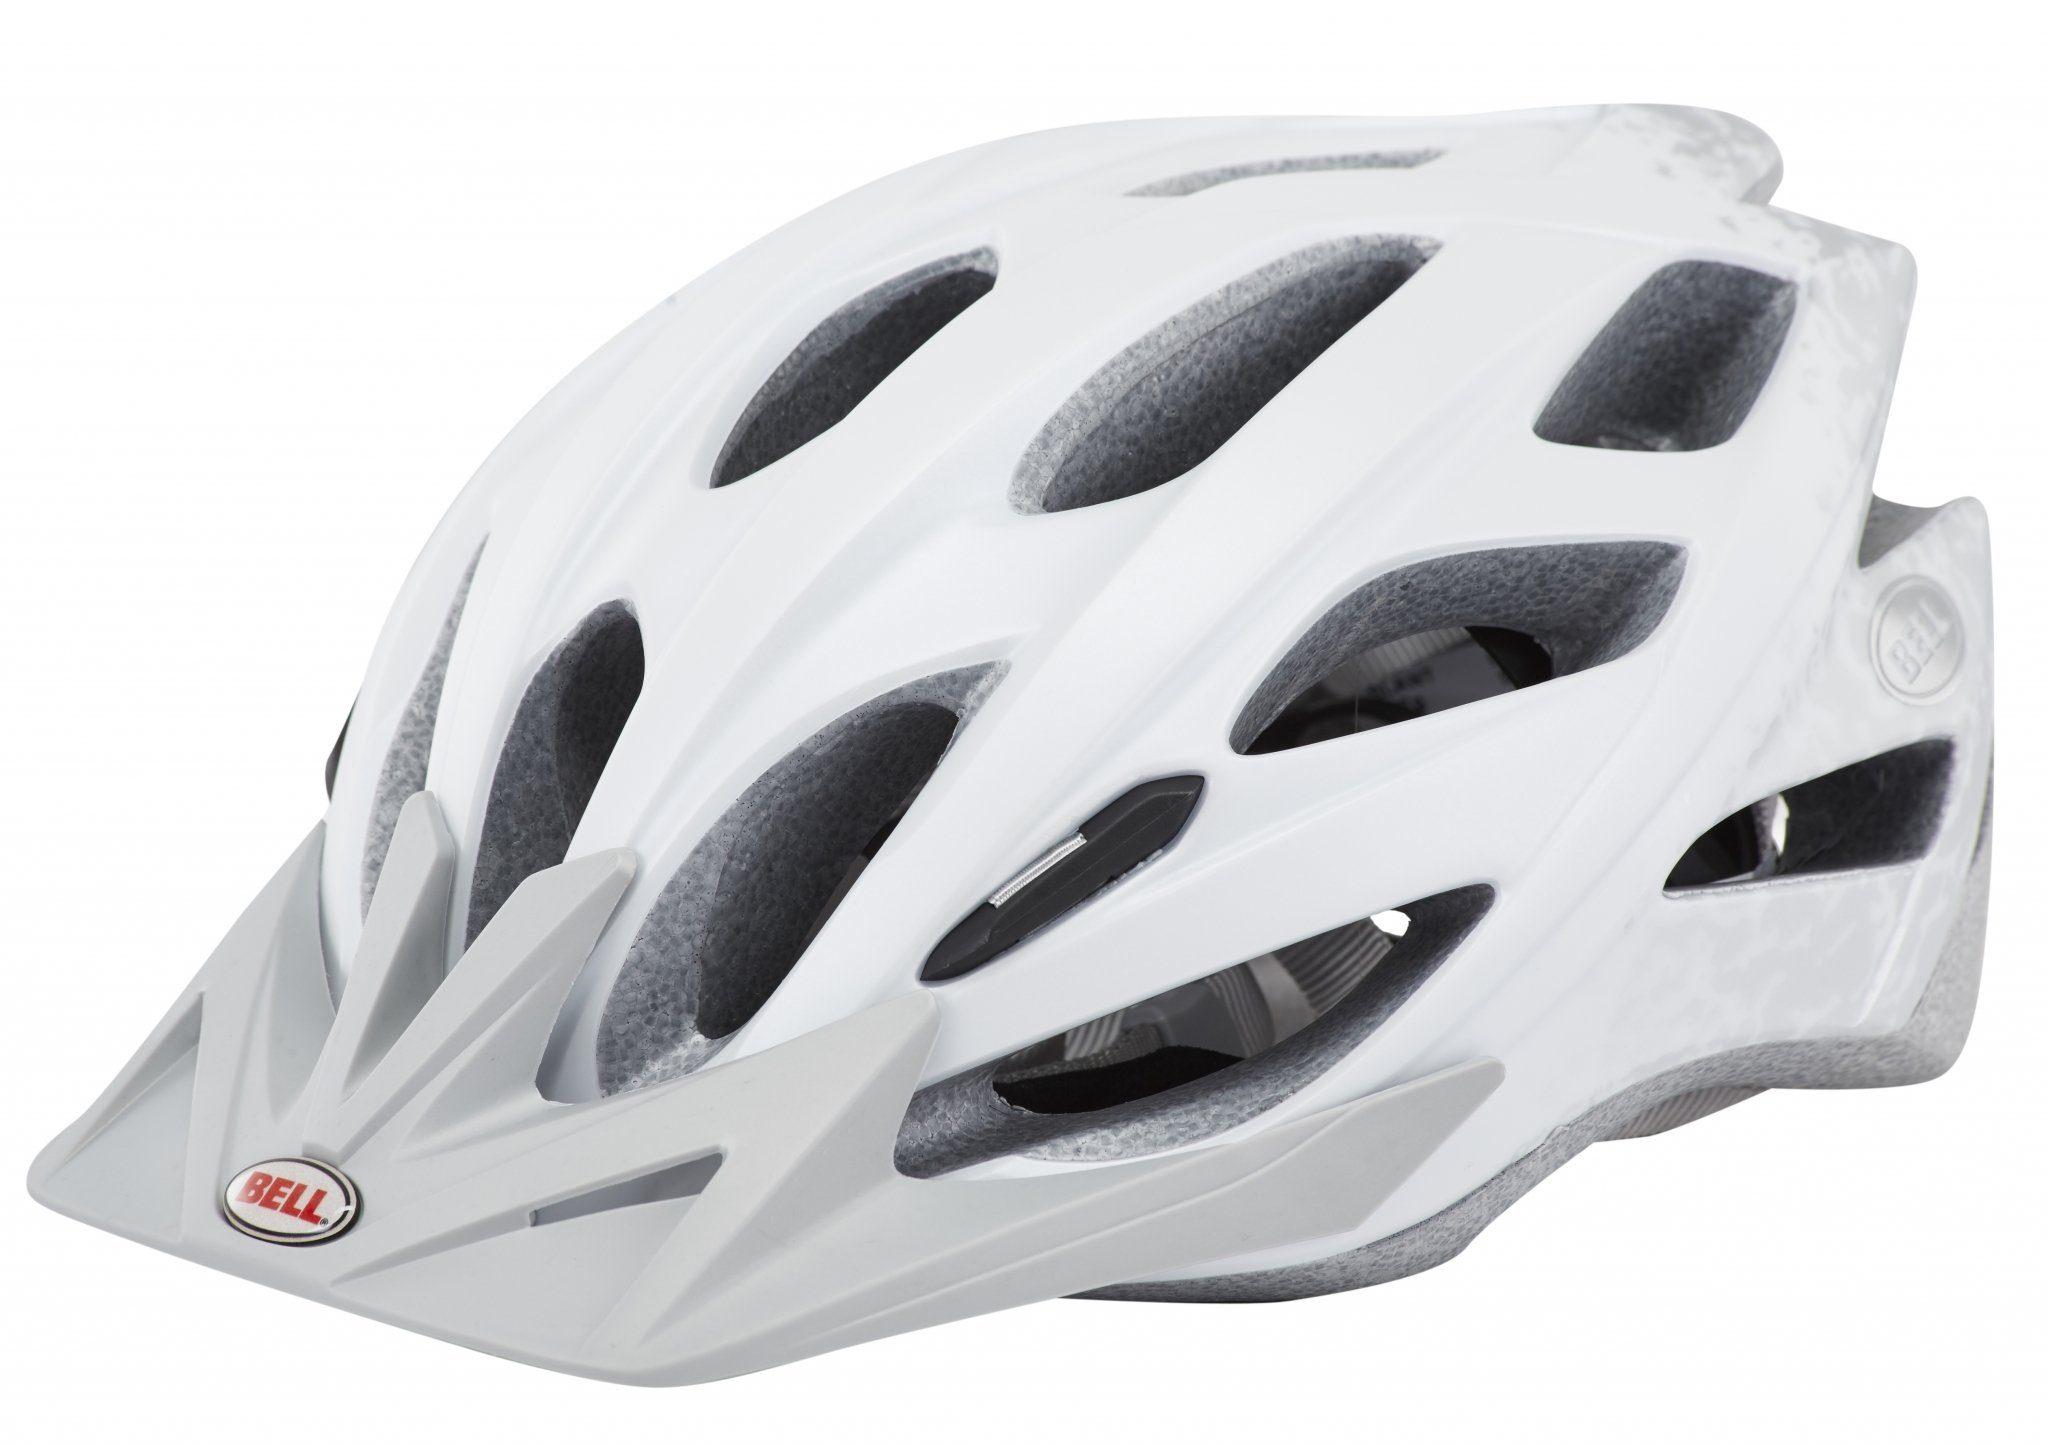 Bell Fahrradhelm »Slant Helm Uni Size«